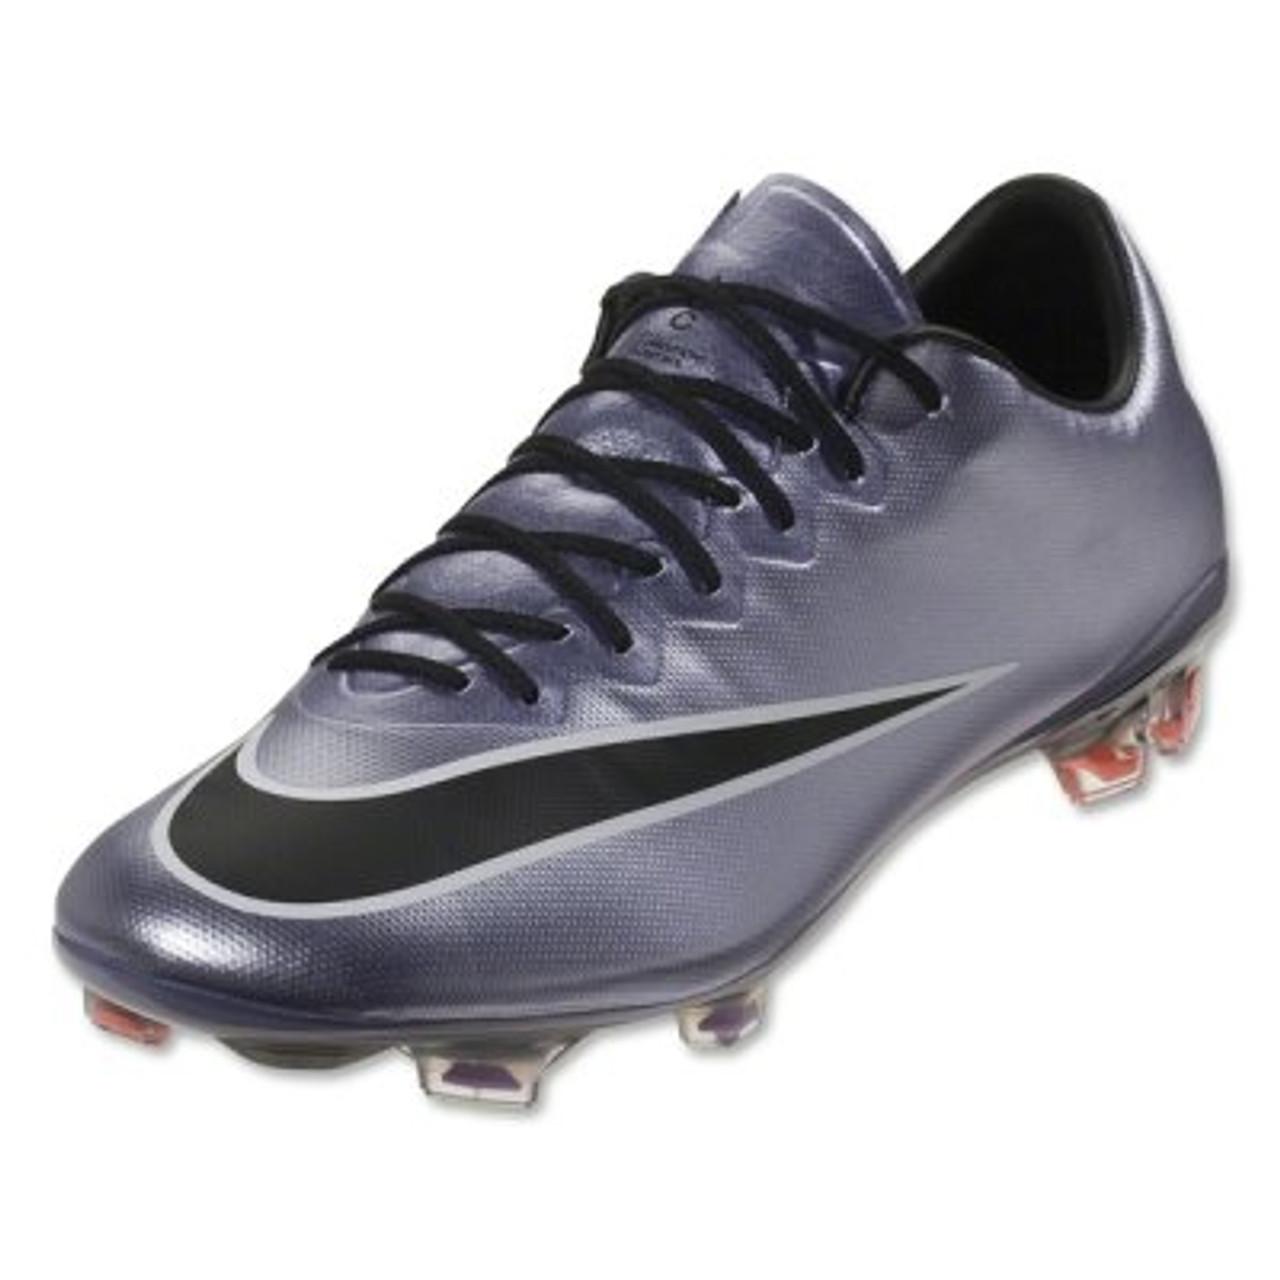 sneakers for cheap 45b03 040f5 Nike Mercurial Vapor X FG - Urban Lilac Black White (122818) - ohp soccer